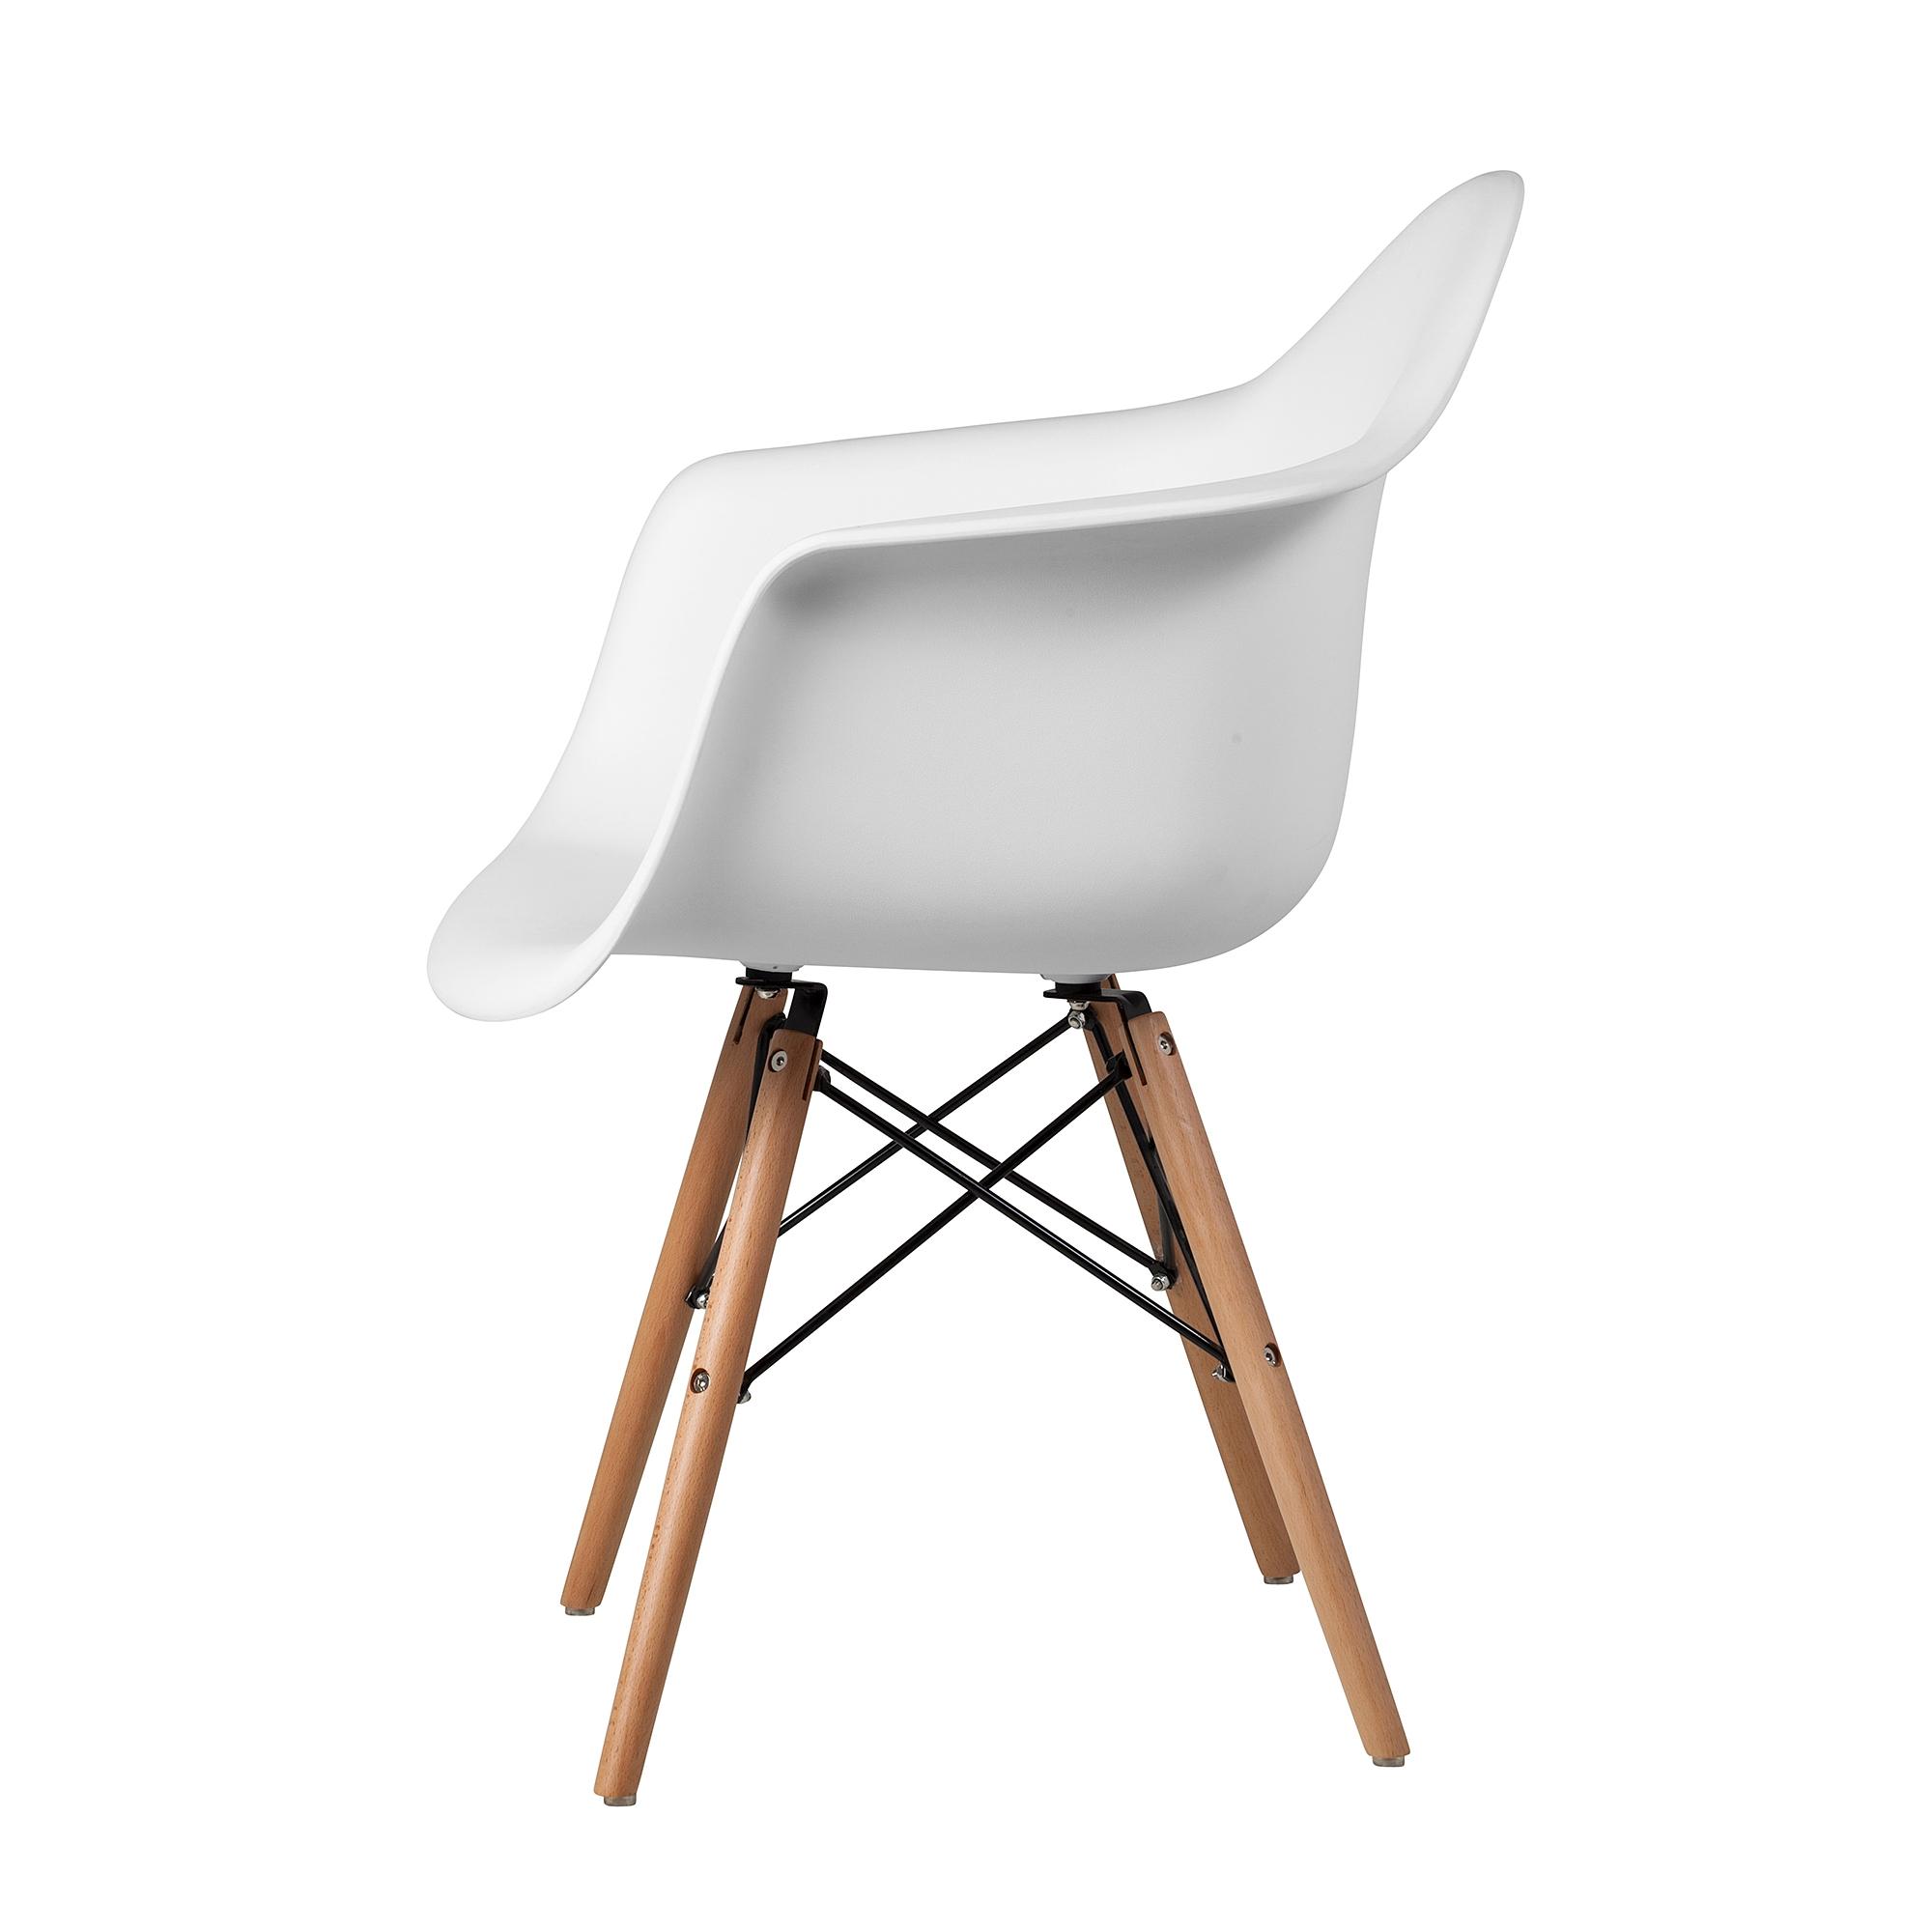 Superieur Charles Eames Style DAW Arm Chair, White ABS Plastic